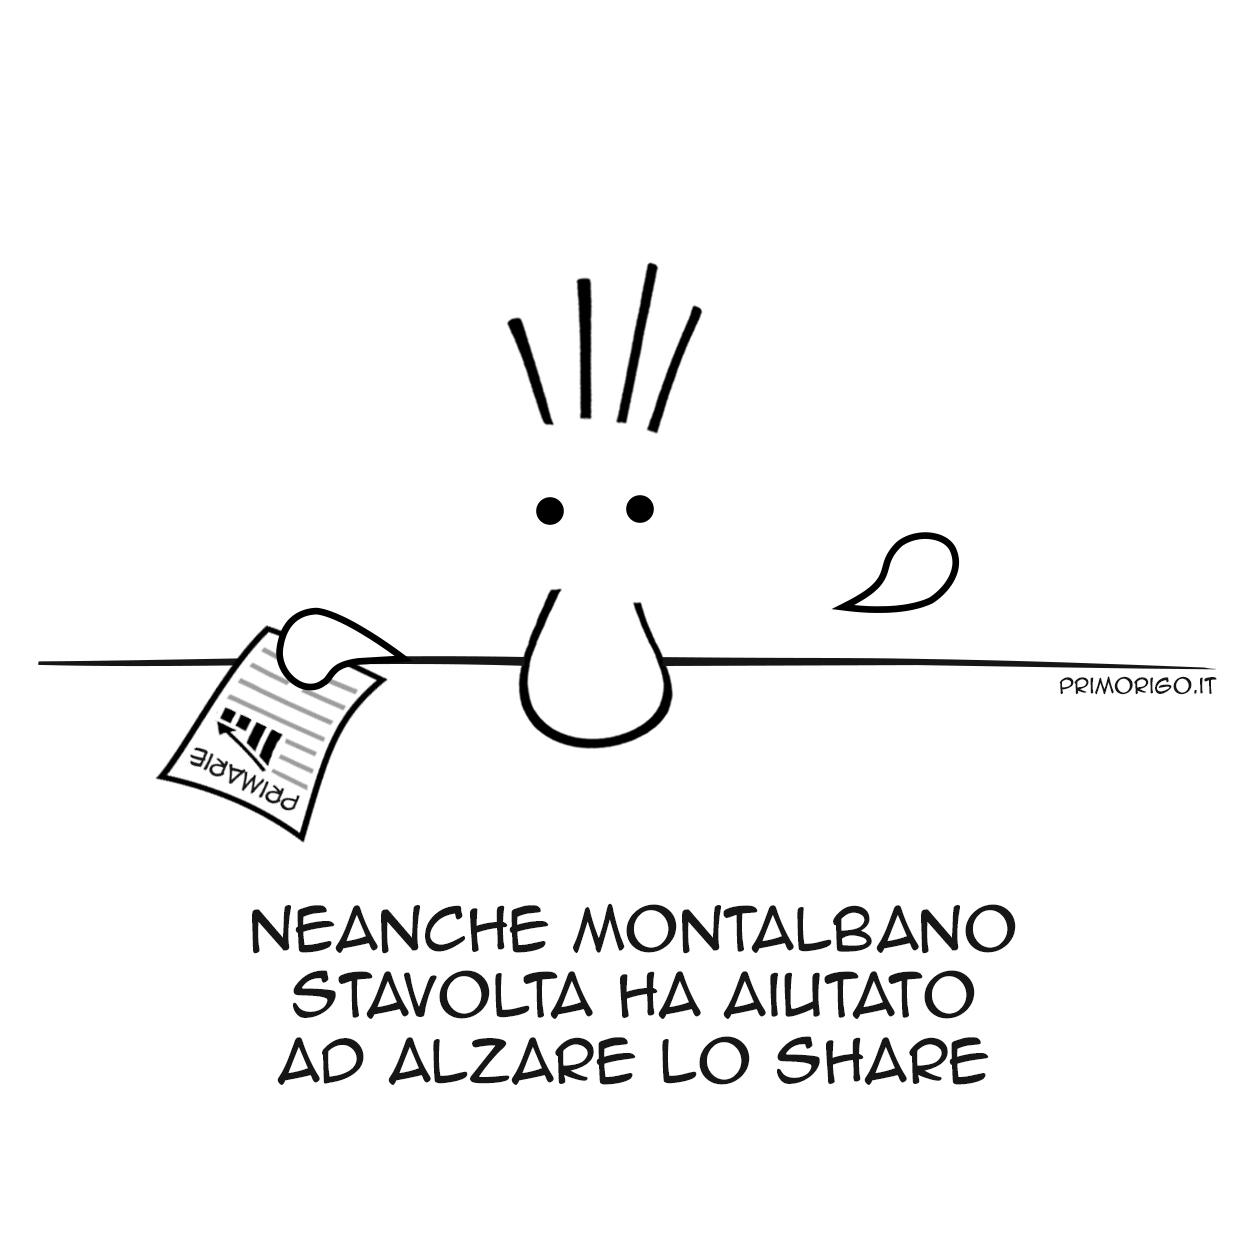 www.primorigo.it